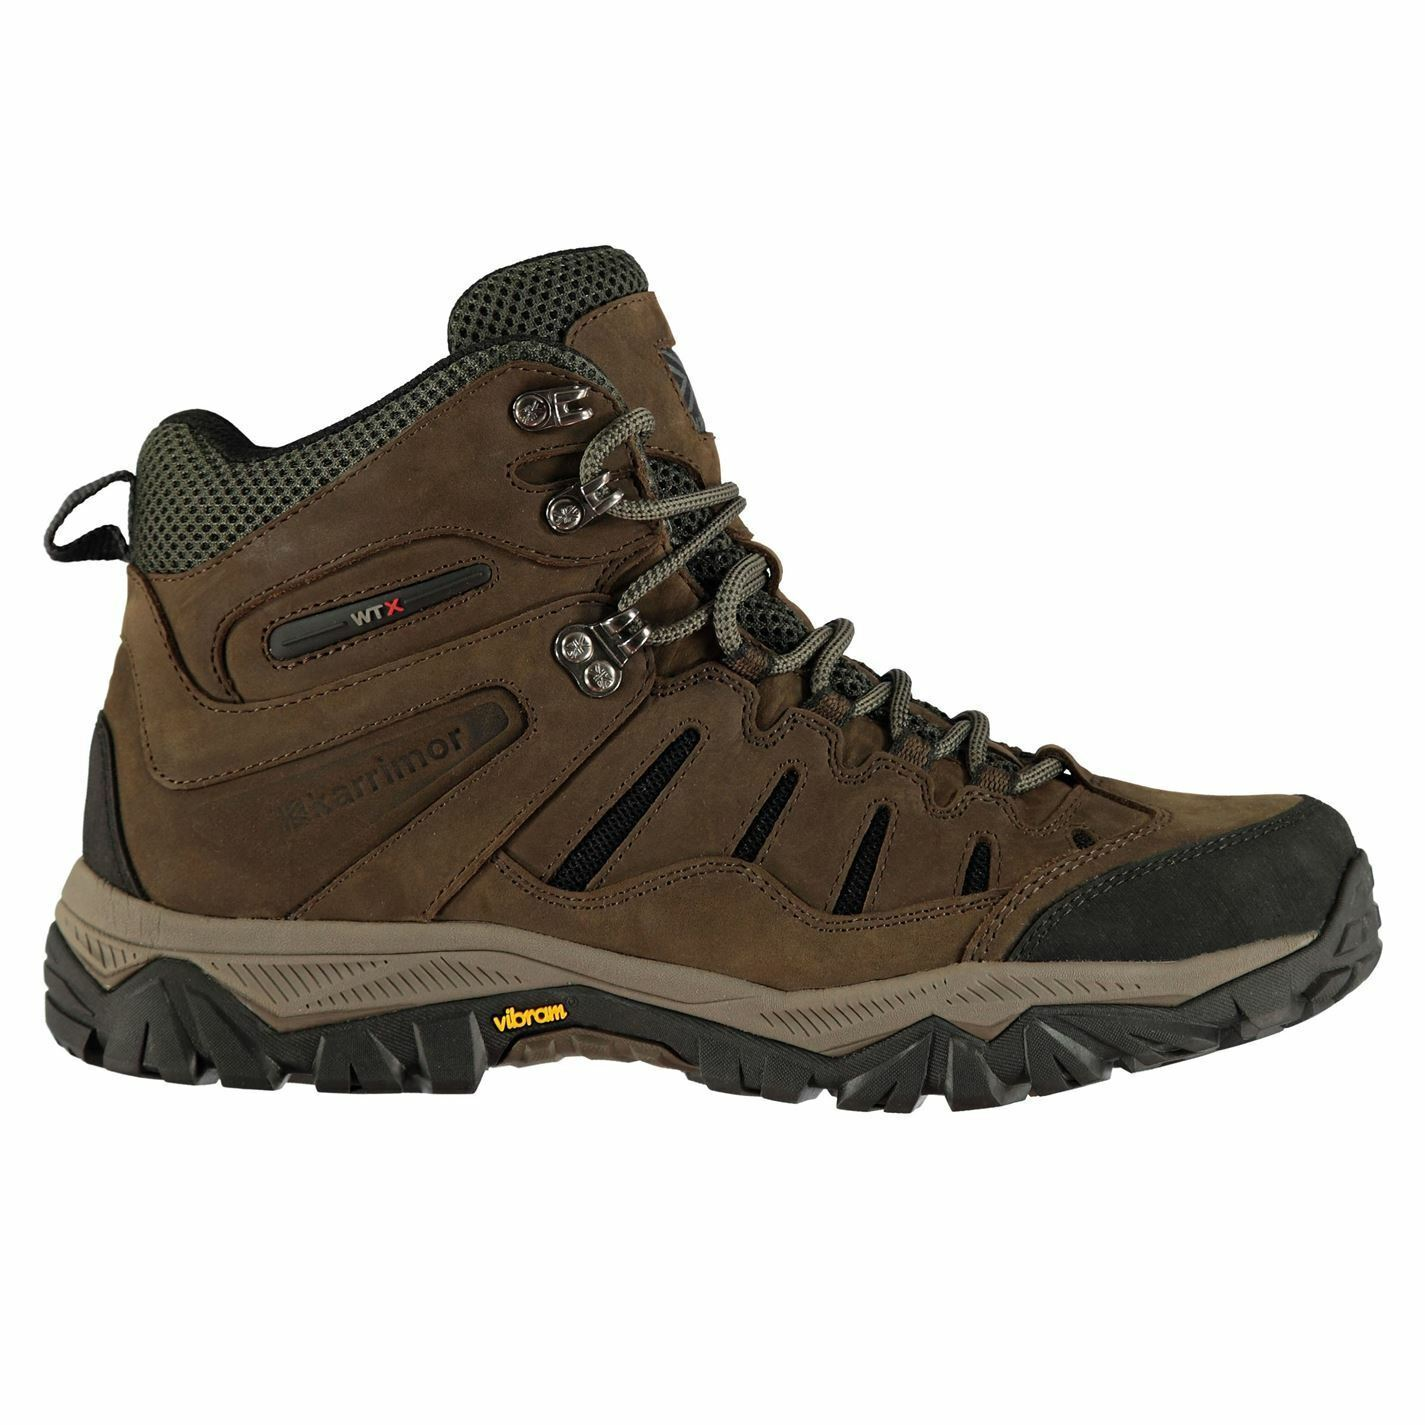 Karrimor Panther WTX Waterproof Mid Walking botas Mens marrón Hiking zapatos